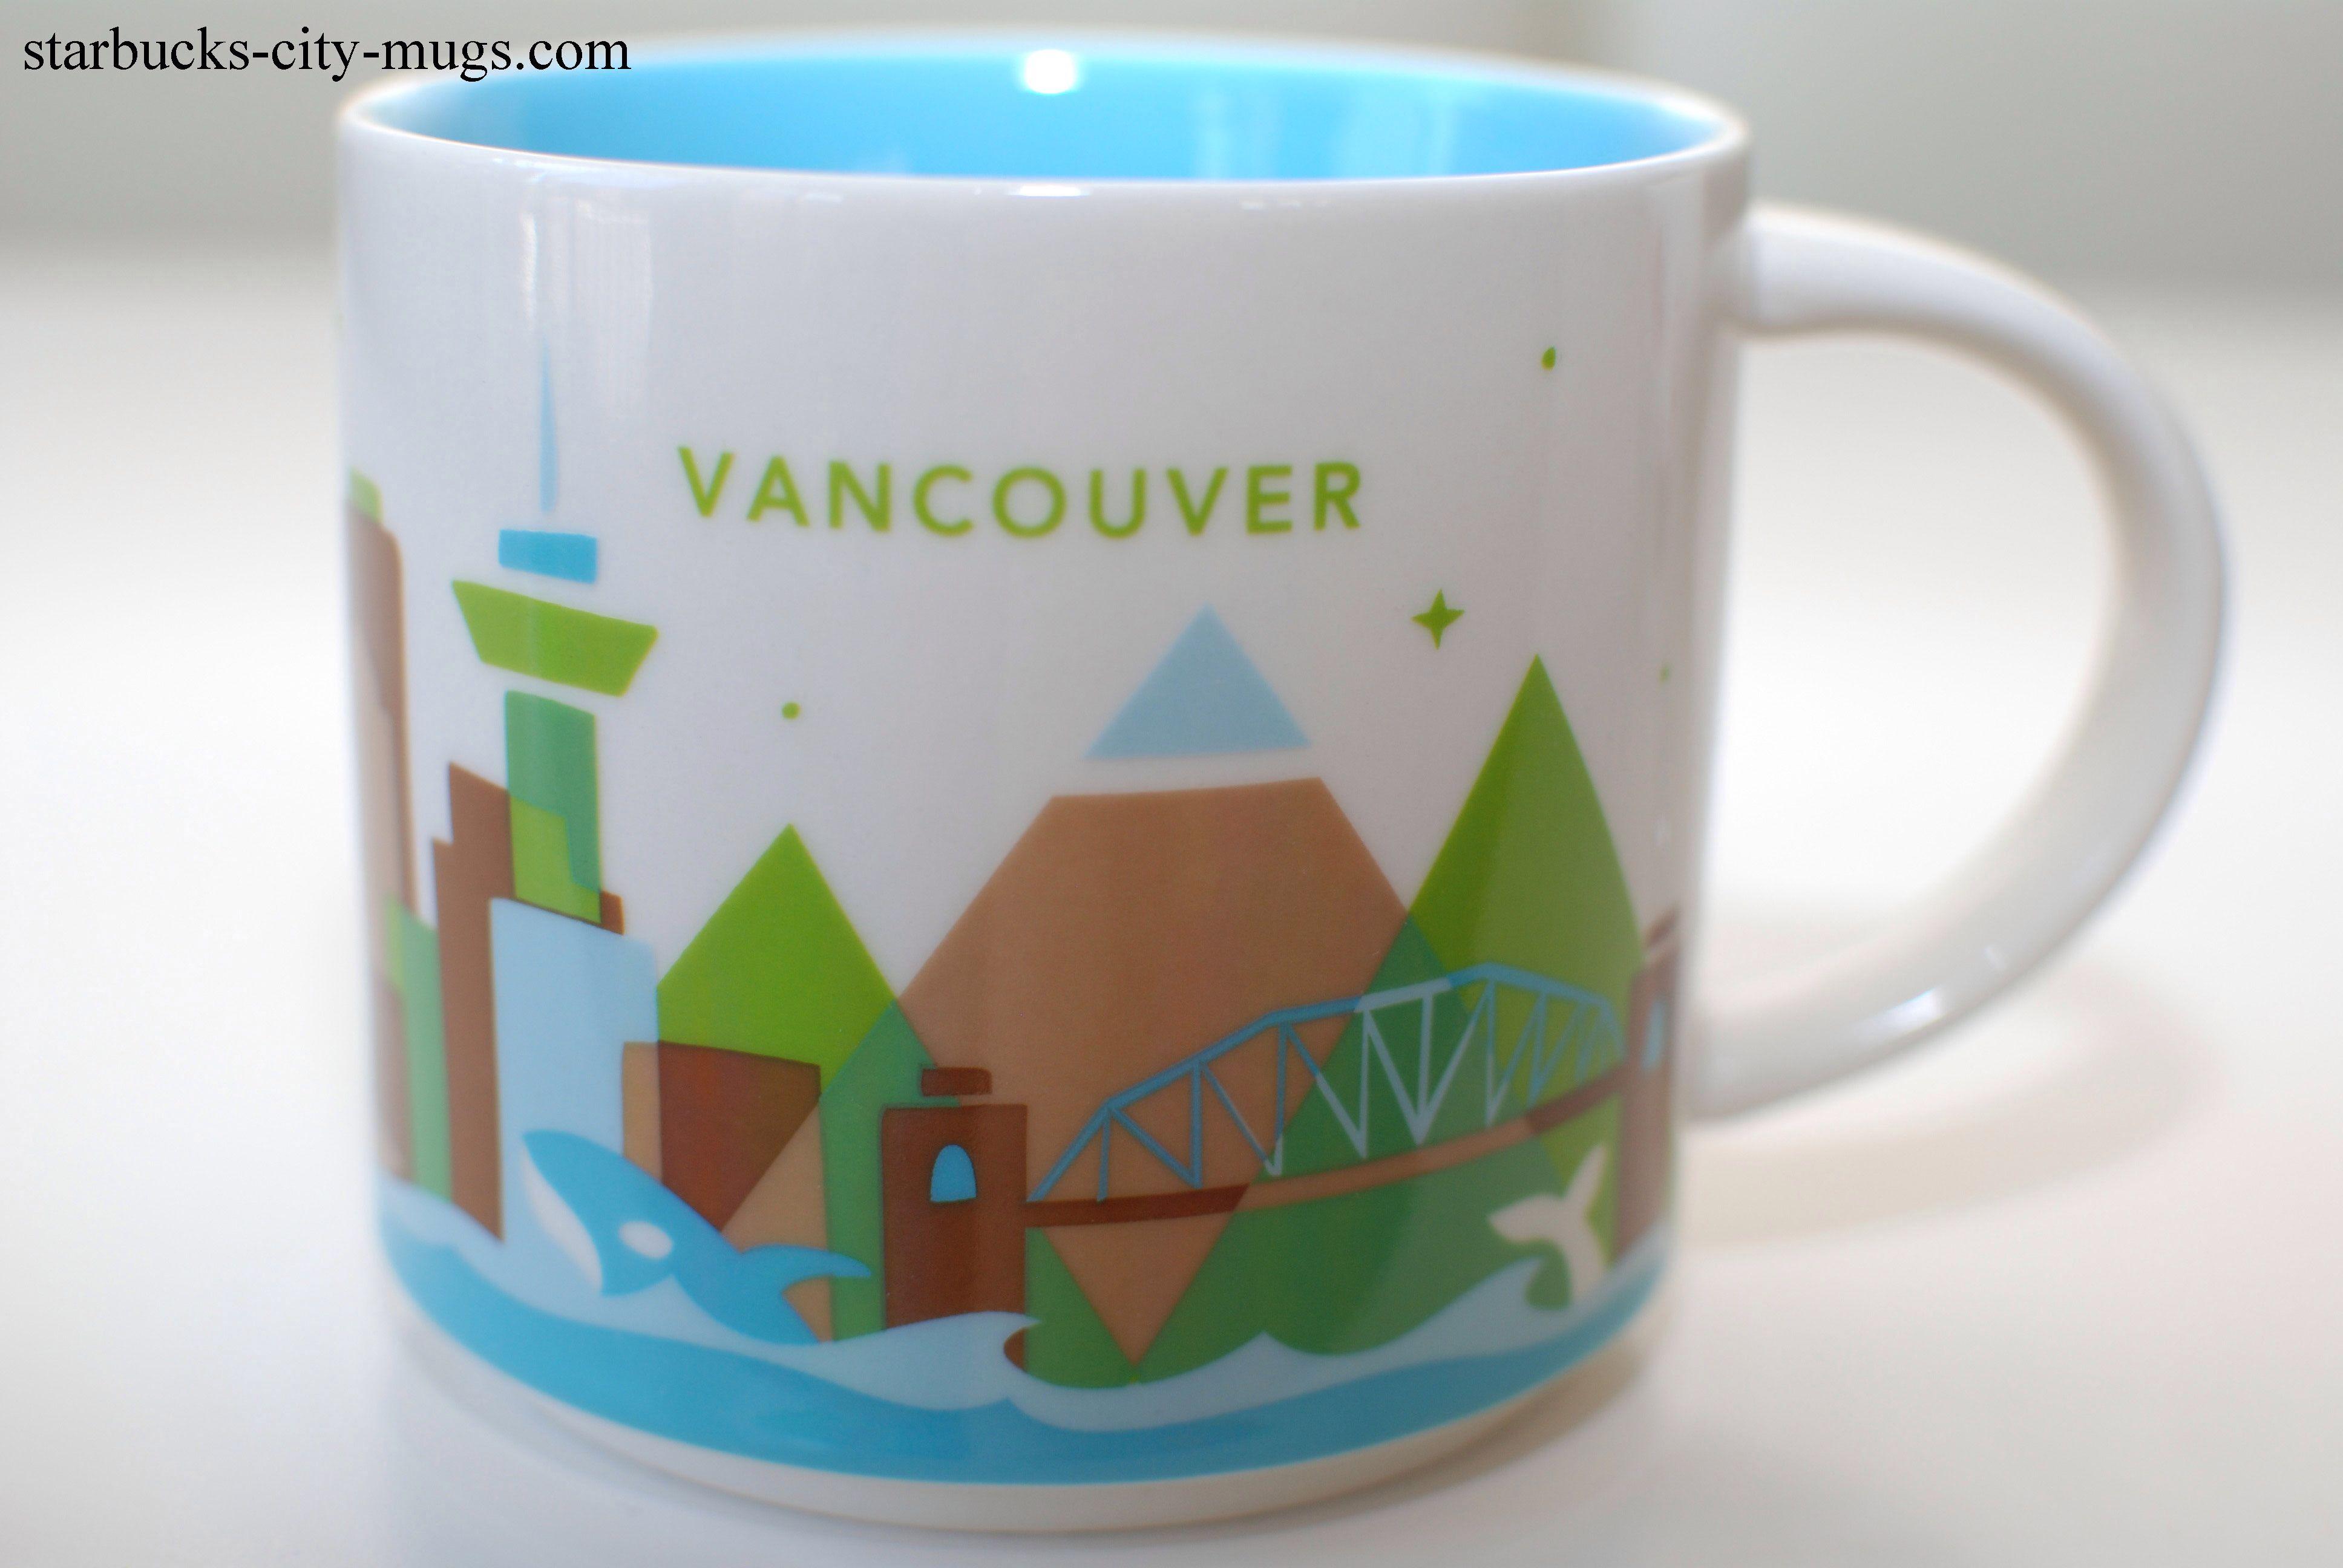 Starbucks You Are Here Mug Vancouver Canada